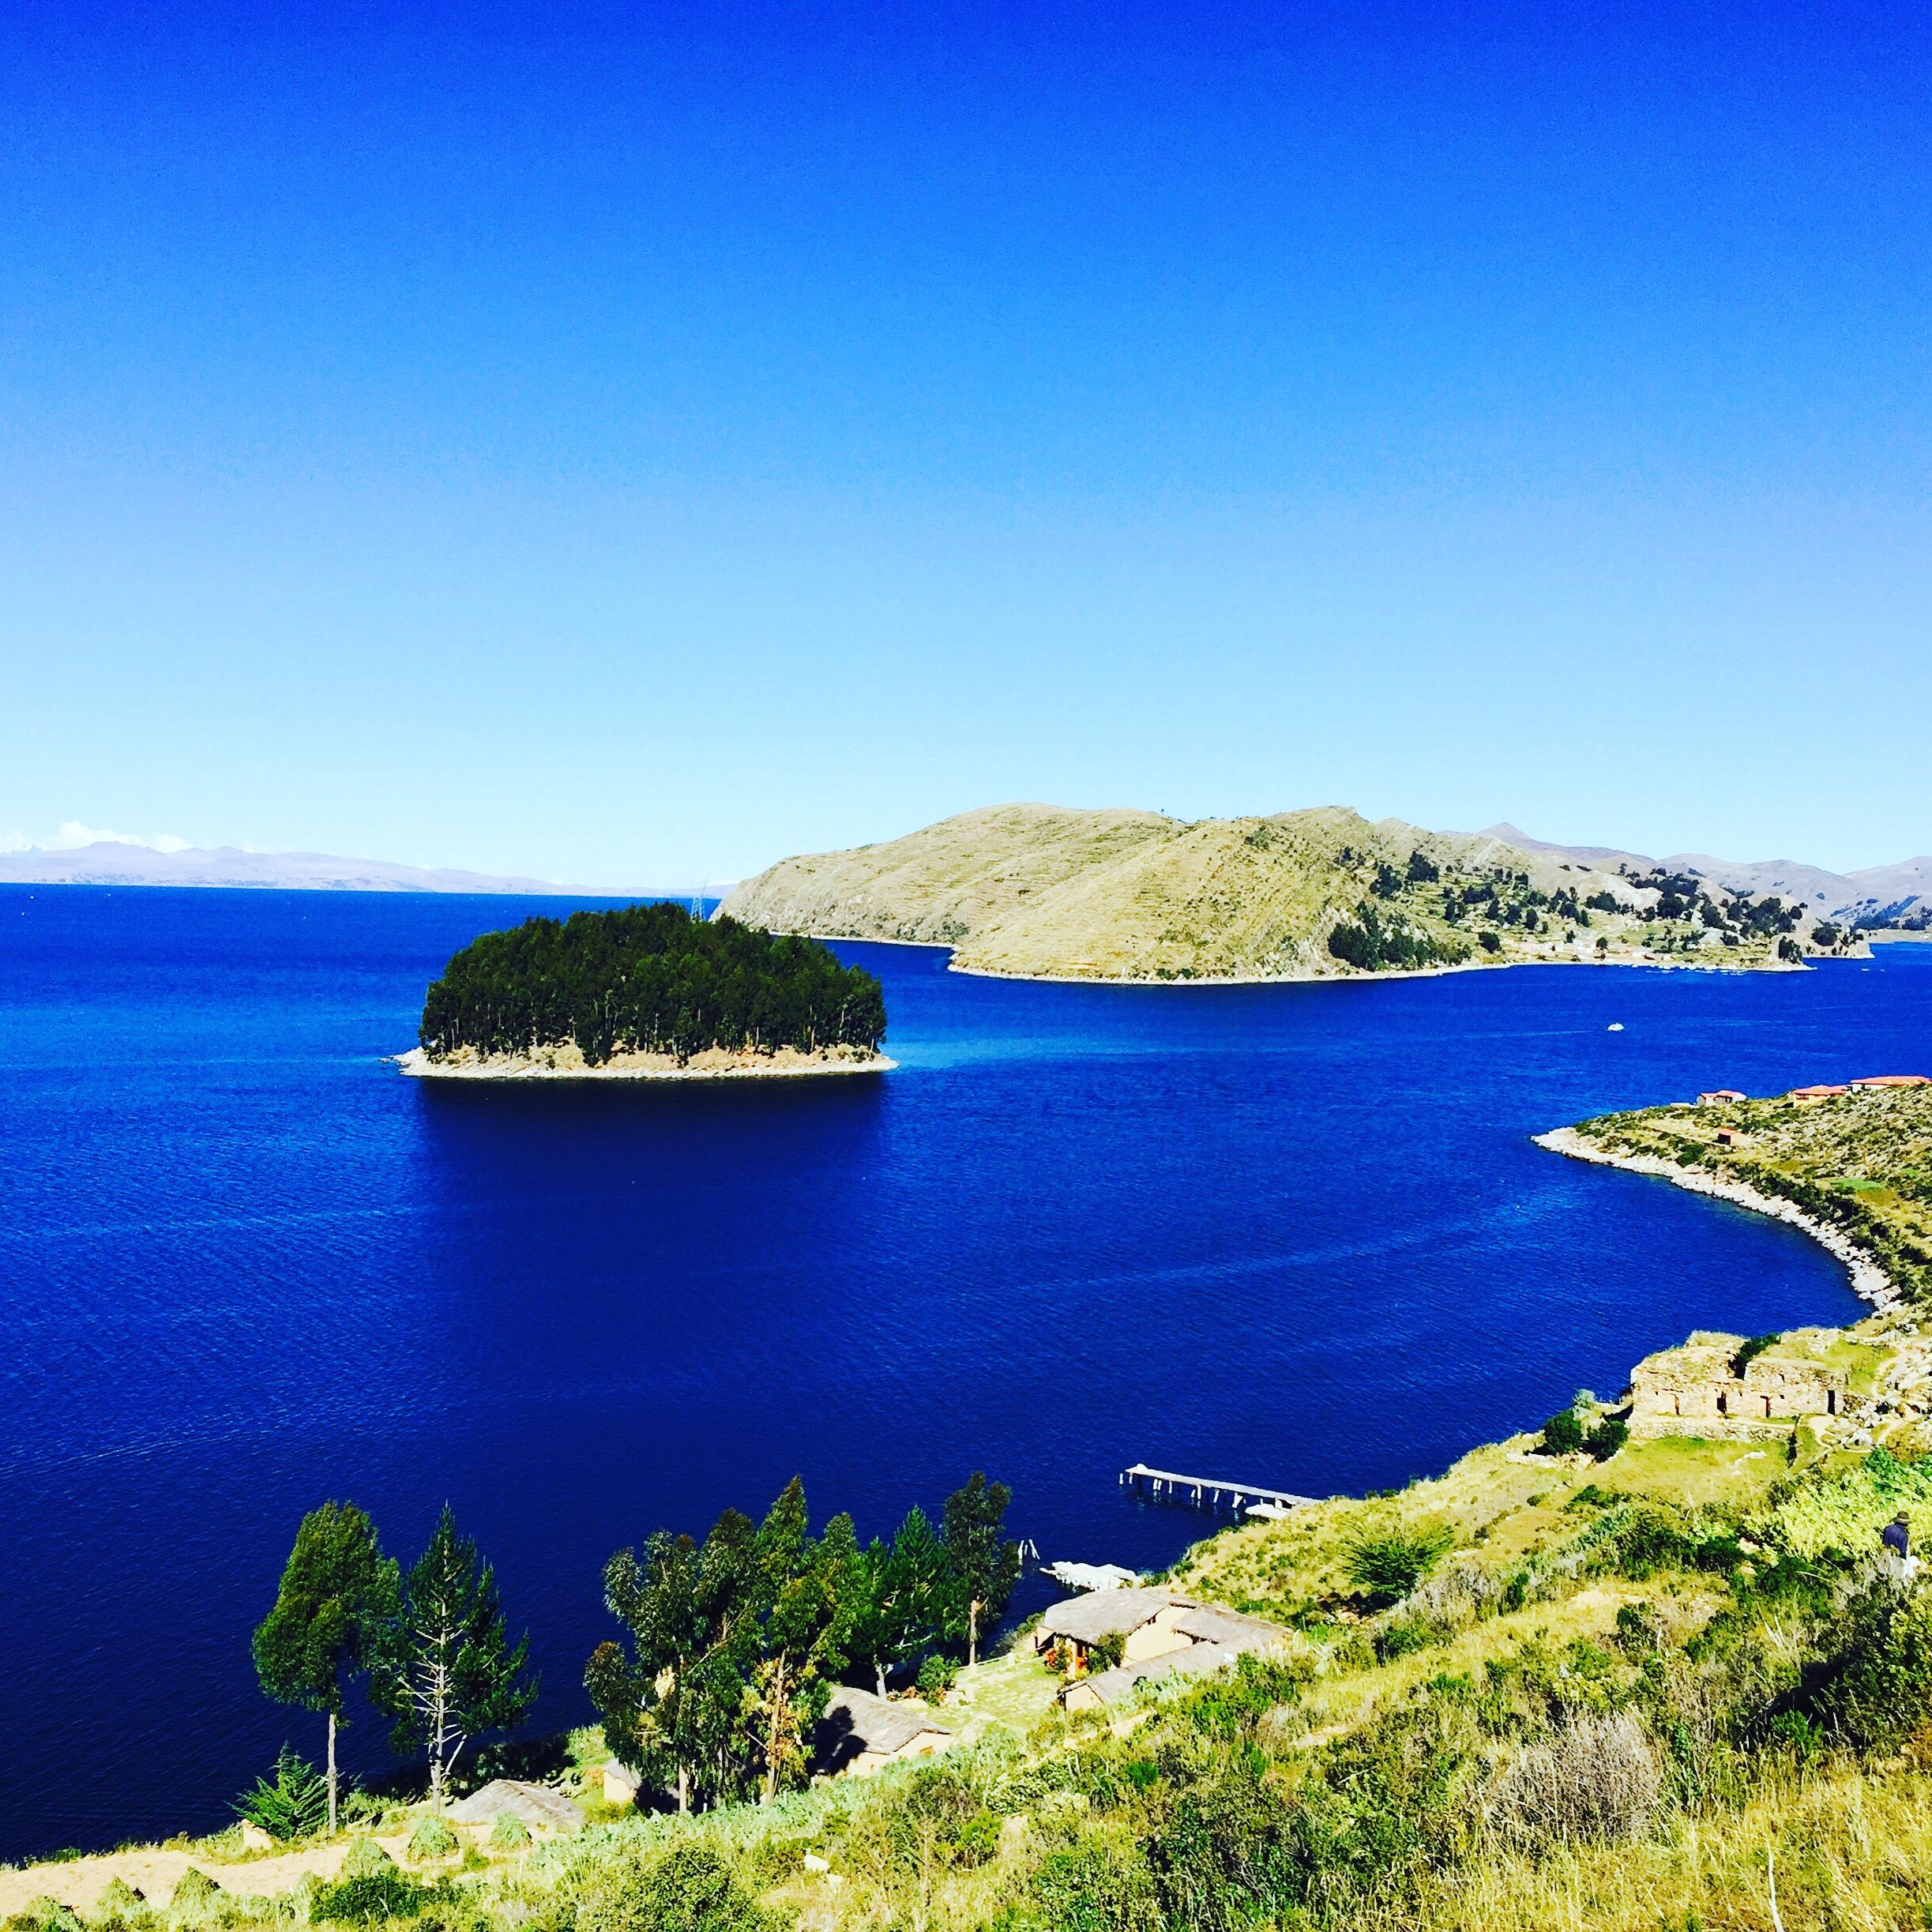 Bolivia_Lake Titicaca 3.JPG